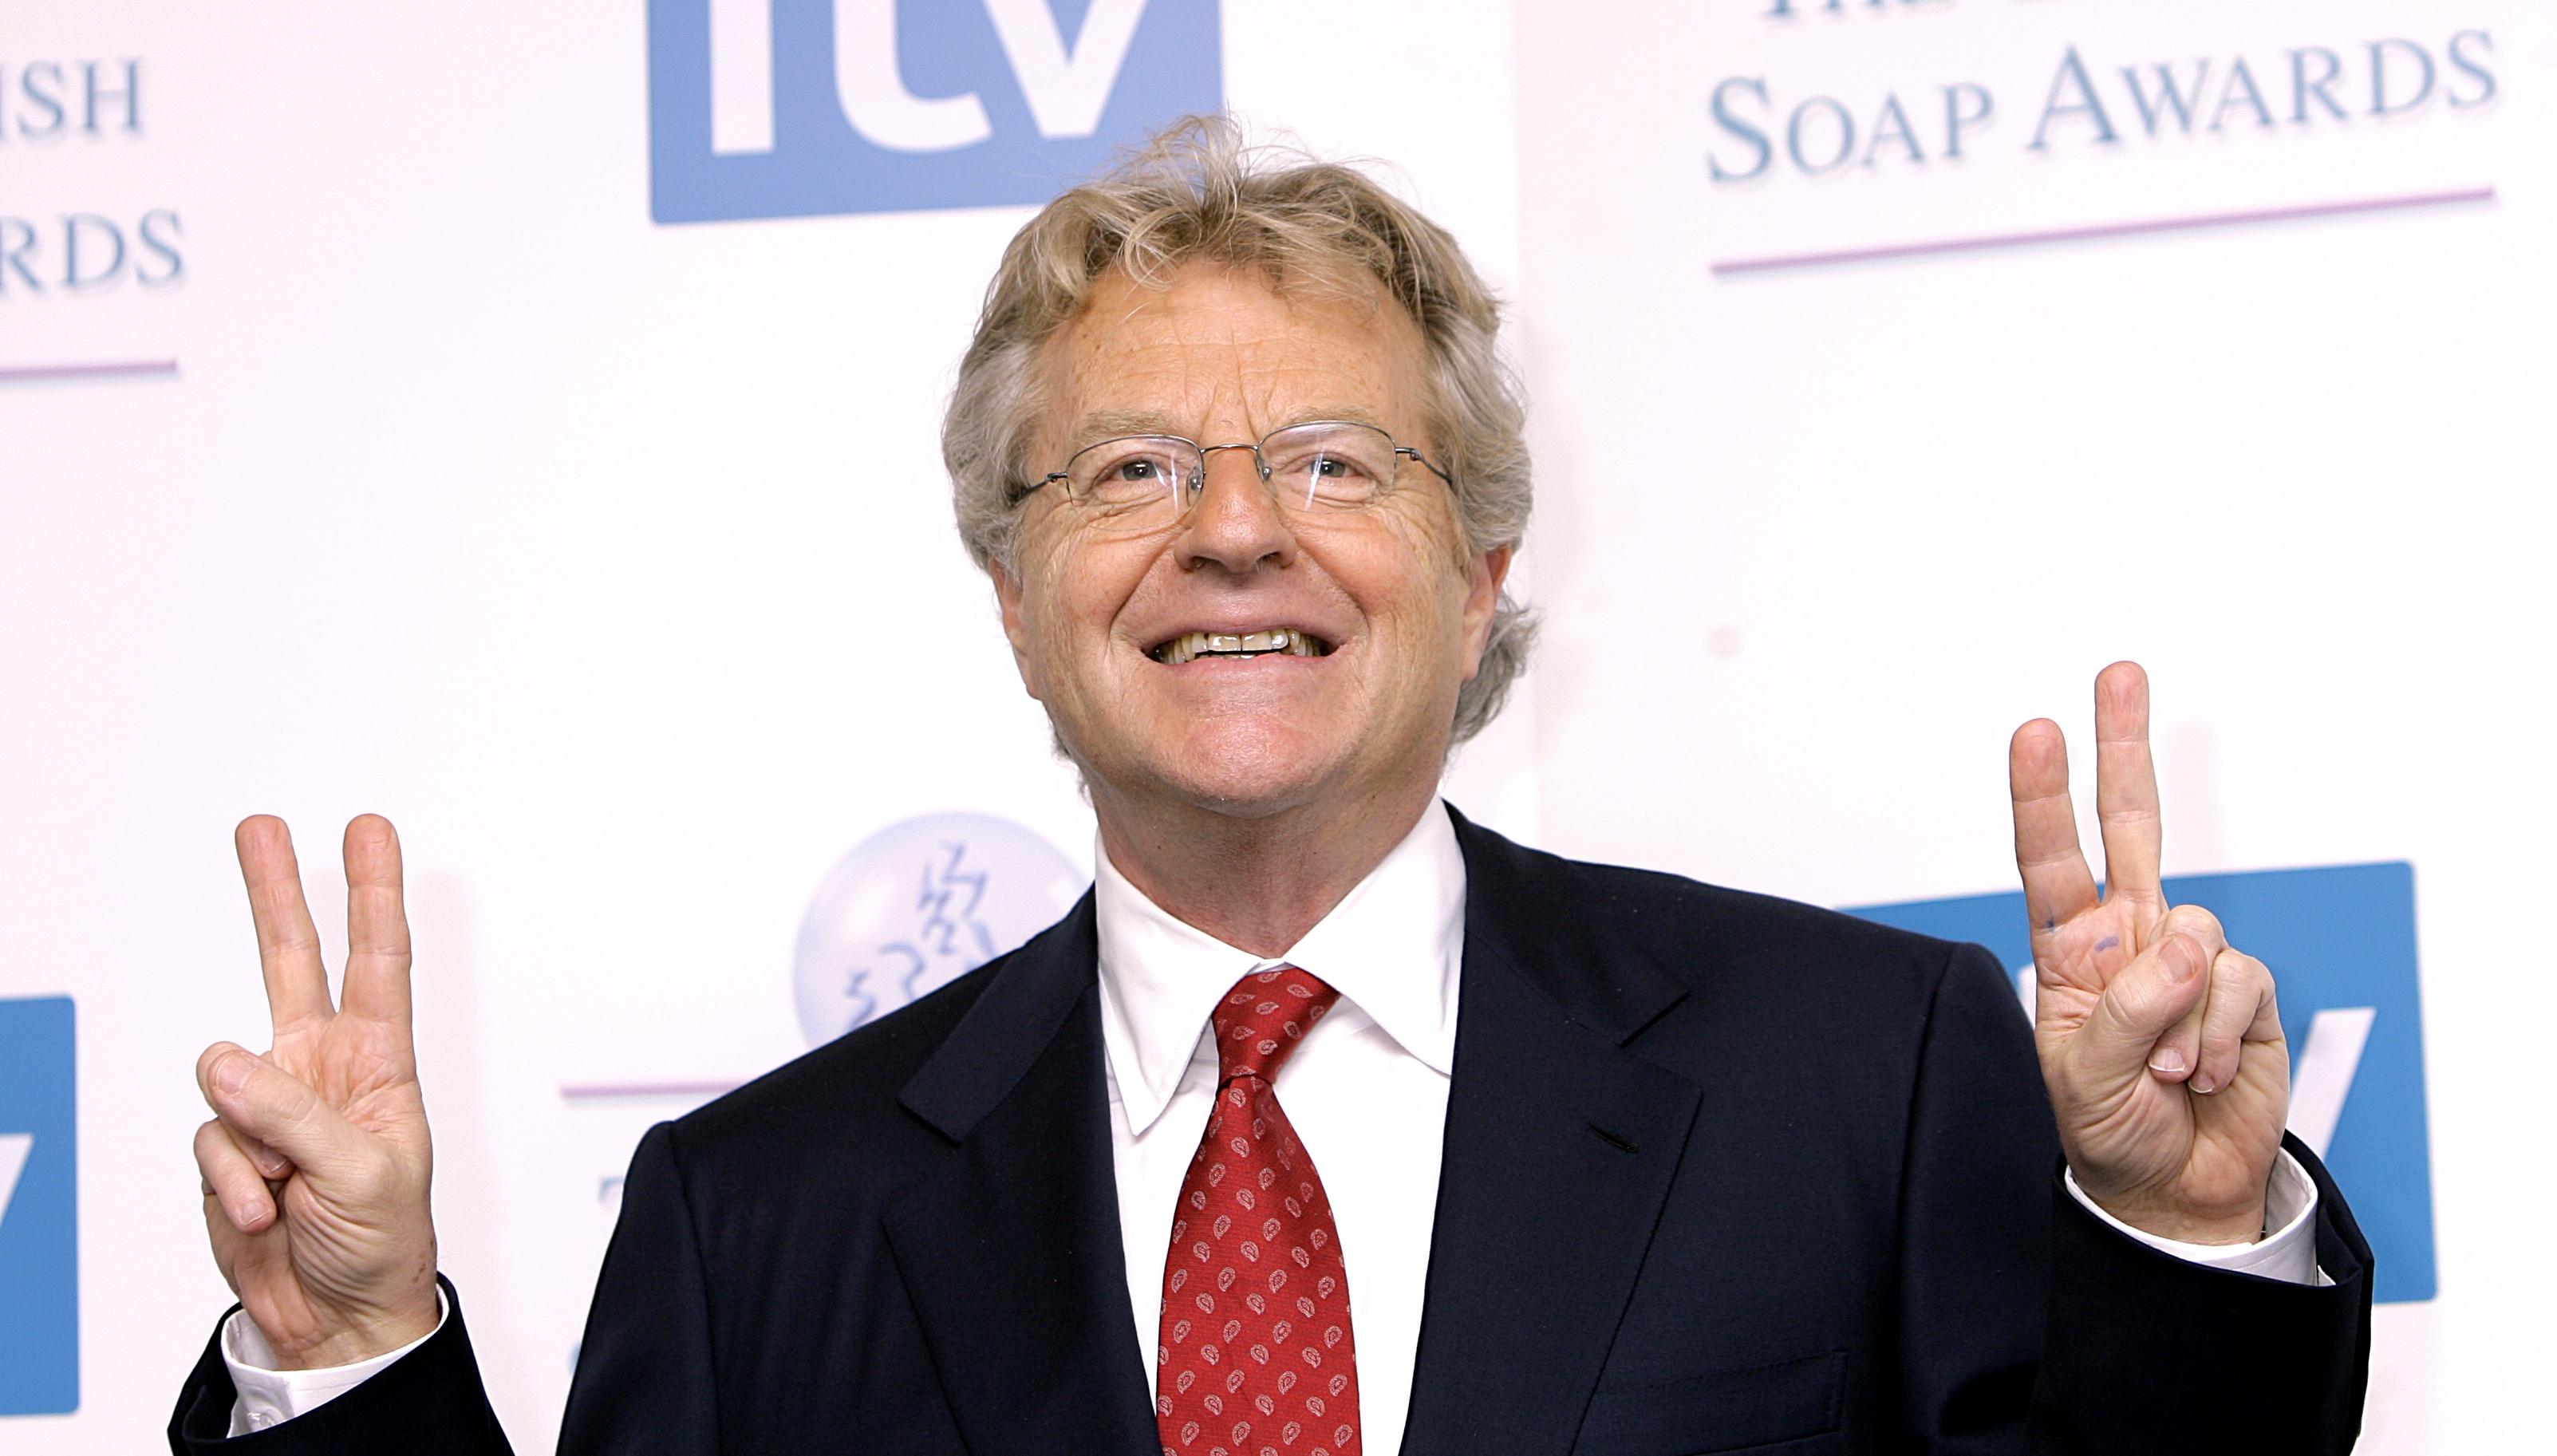 The British Soap Awards 2007 - Press Room - London